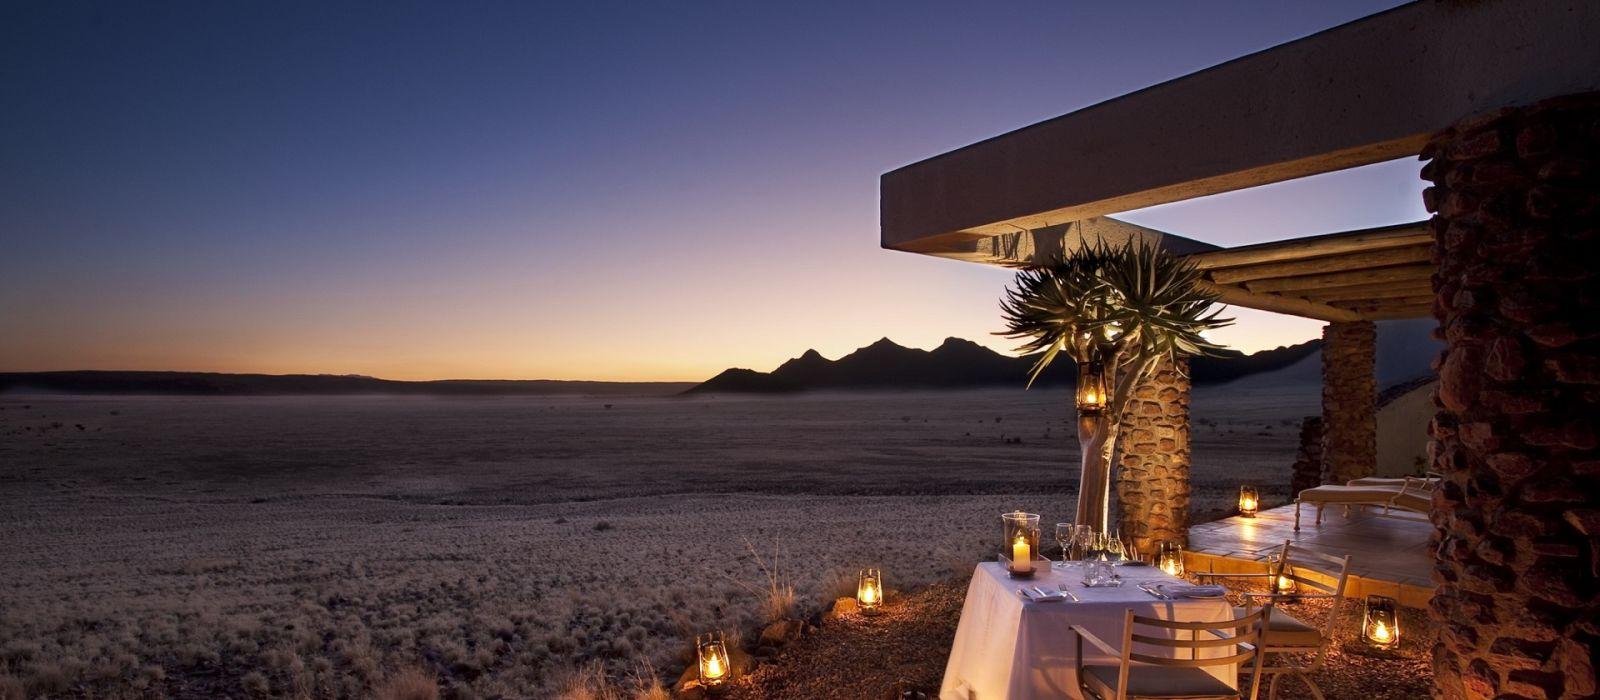 Namibia's Northern Gems Tour Trip 1